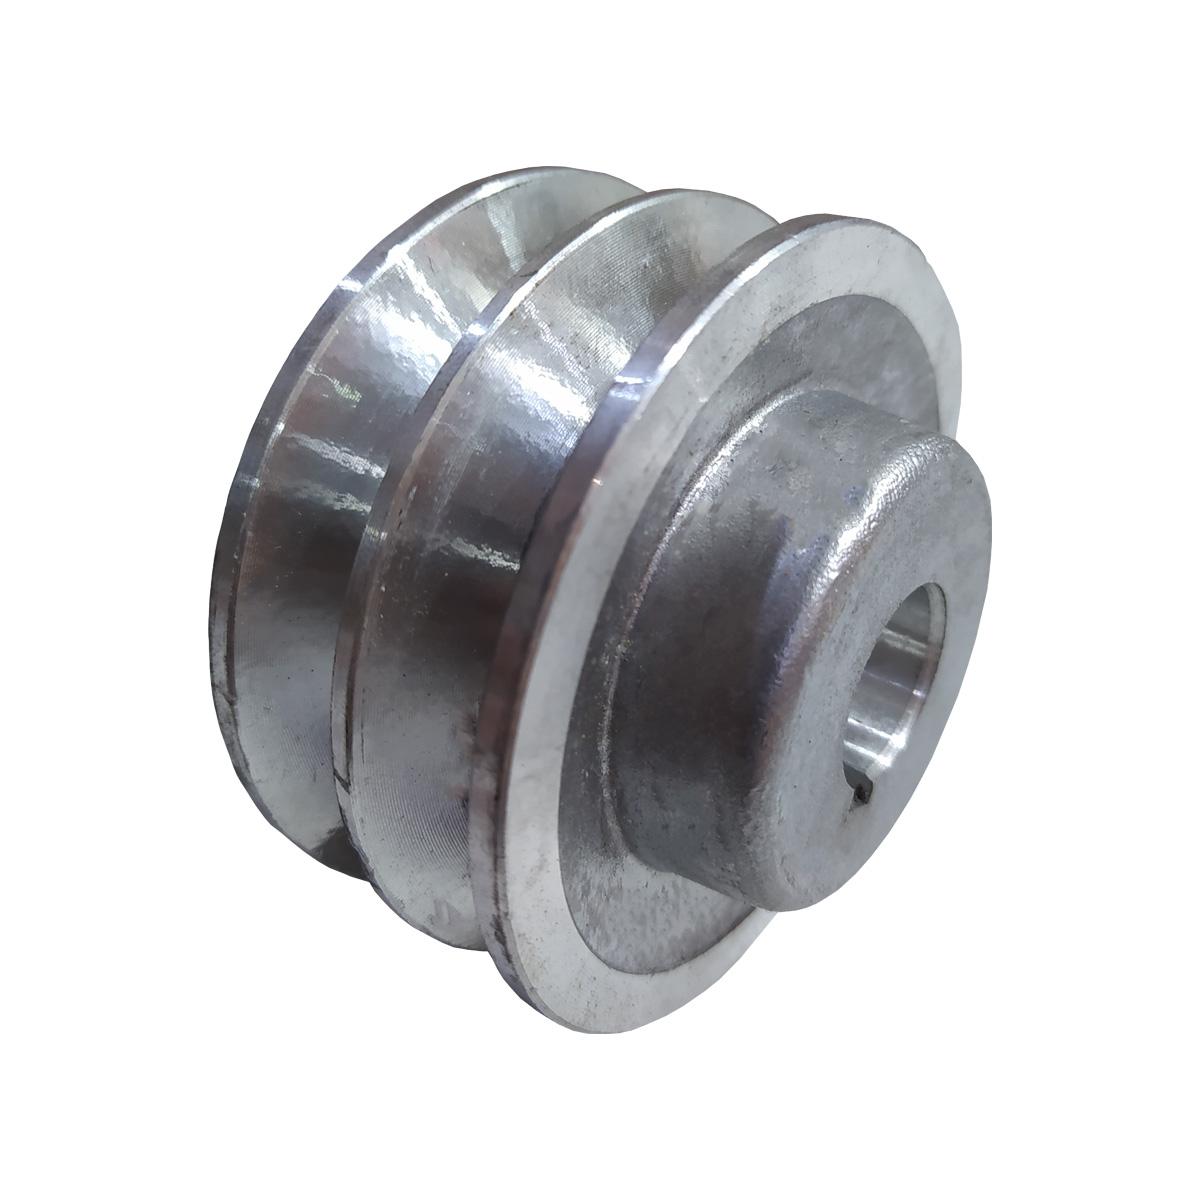 Polia De Aluminio 120mm Motor Furo 28mm 2 Canal A Chaveta